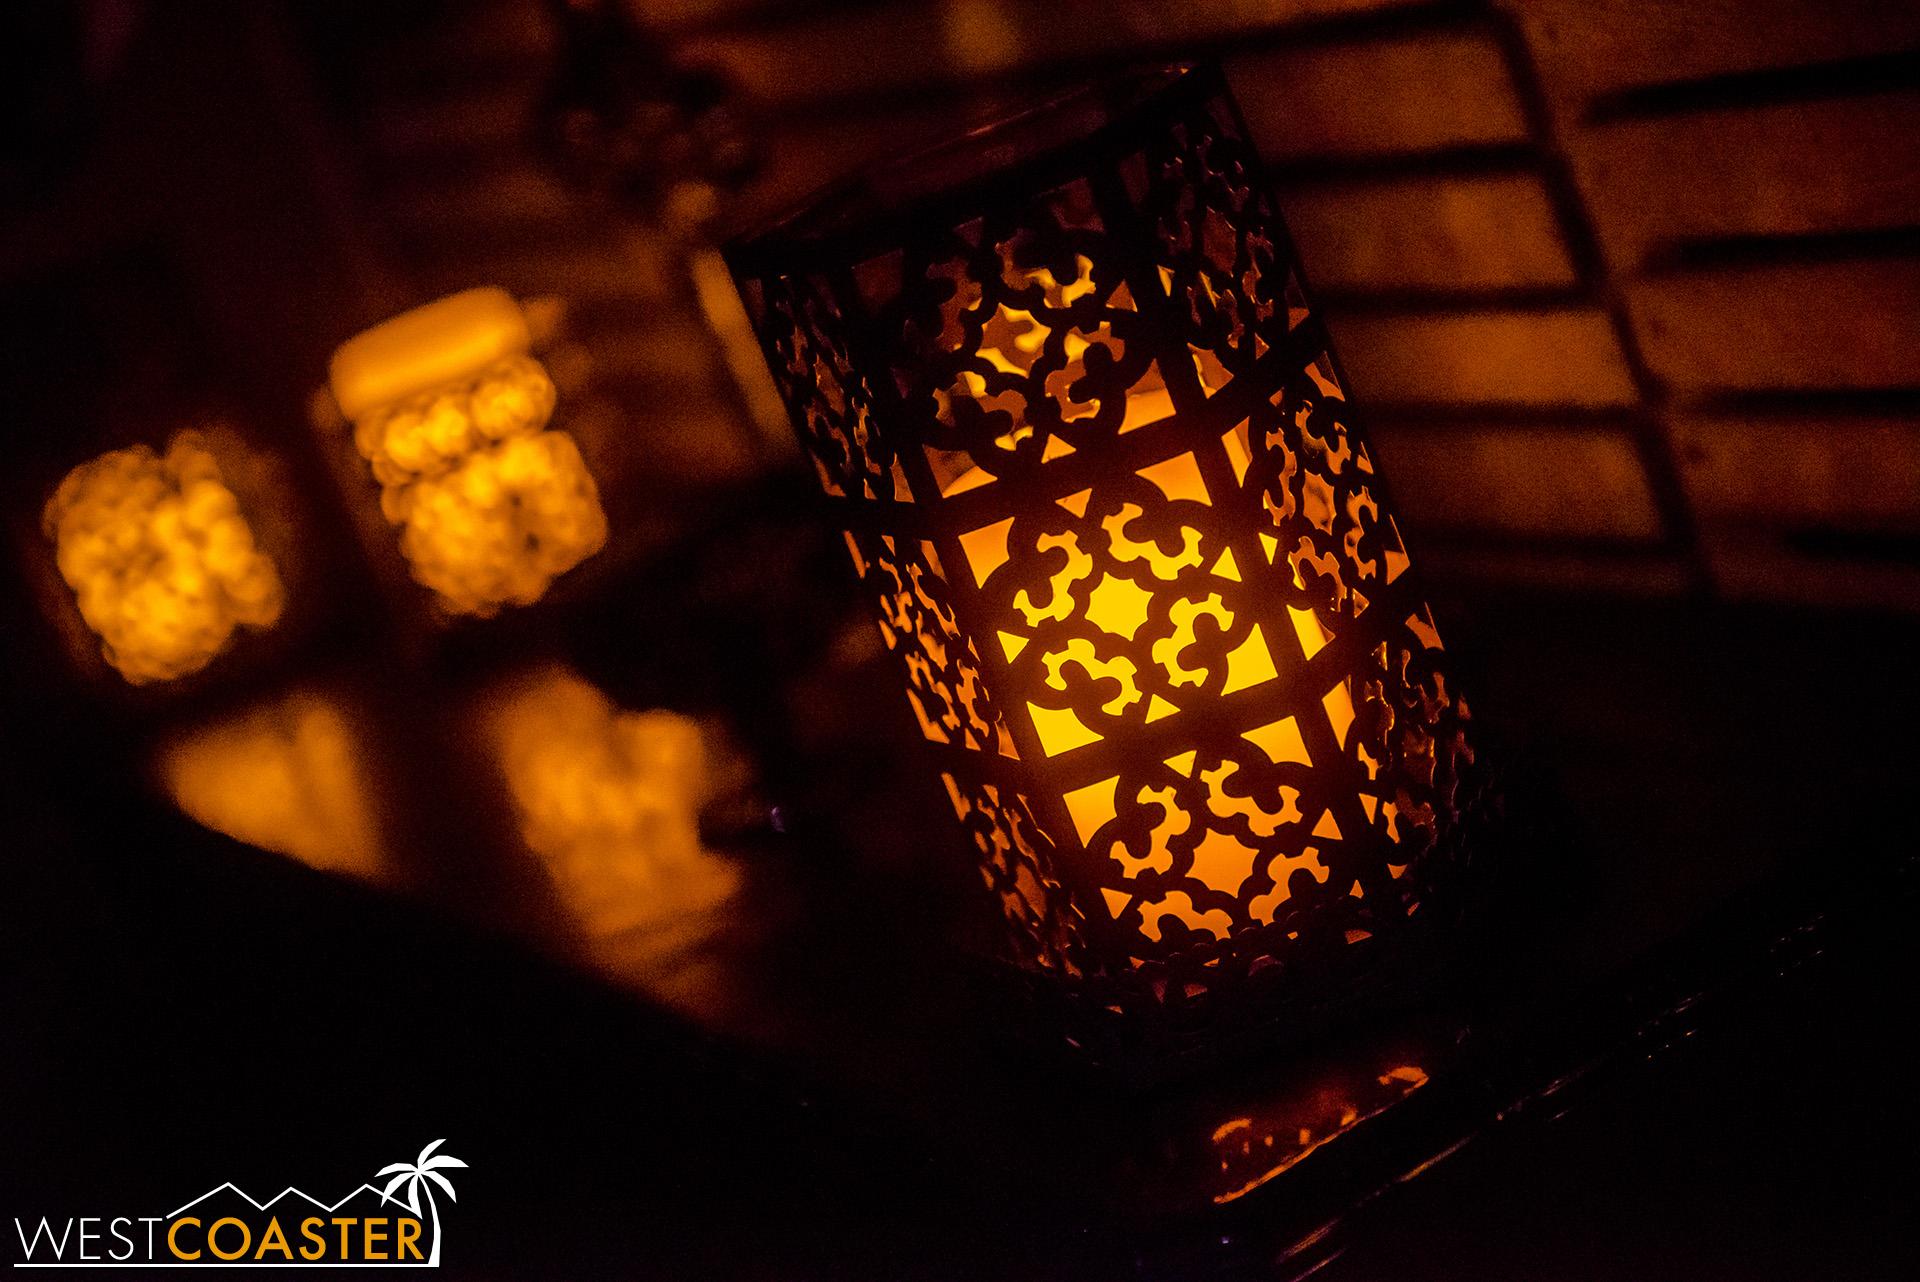 Plenty of candlelights enhance the ambiance.